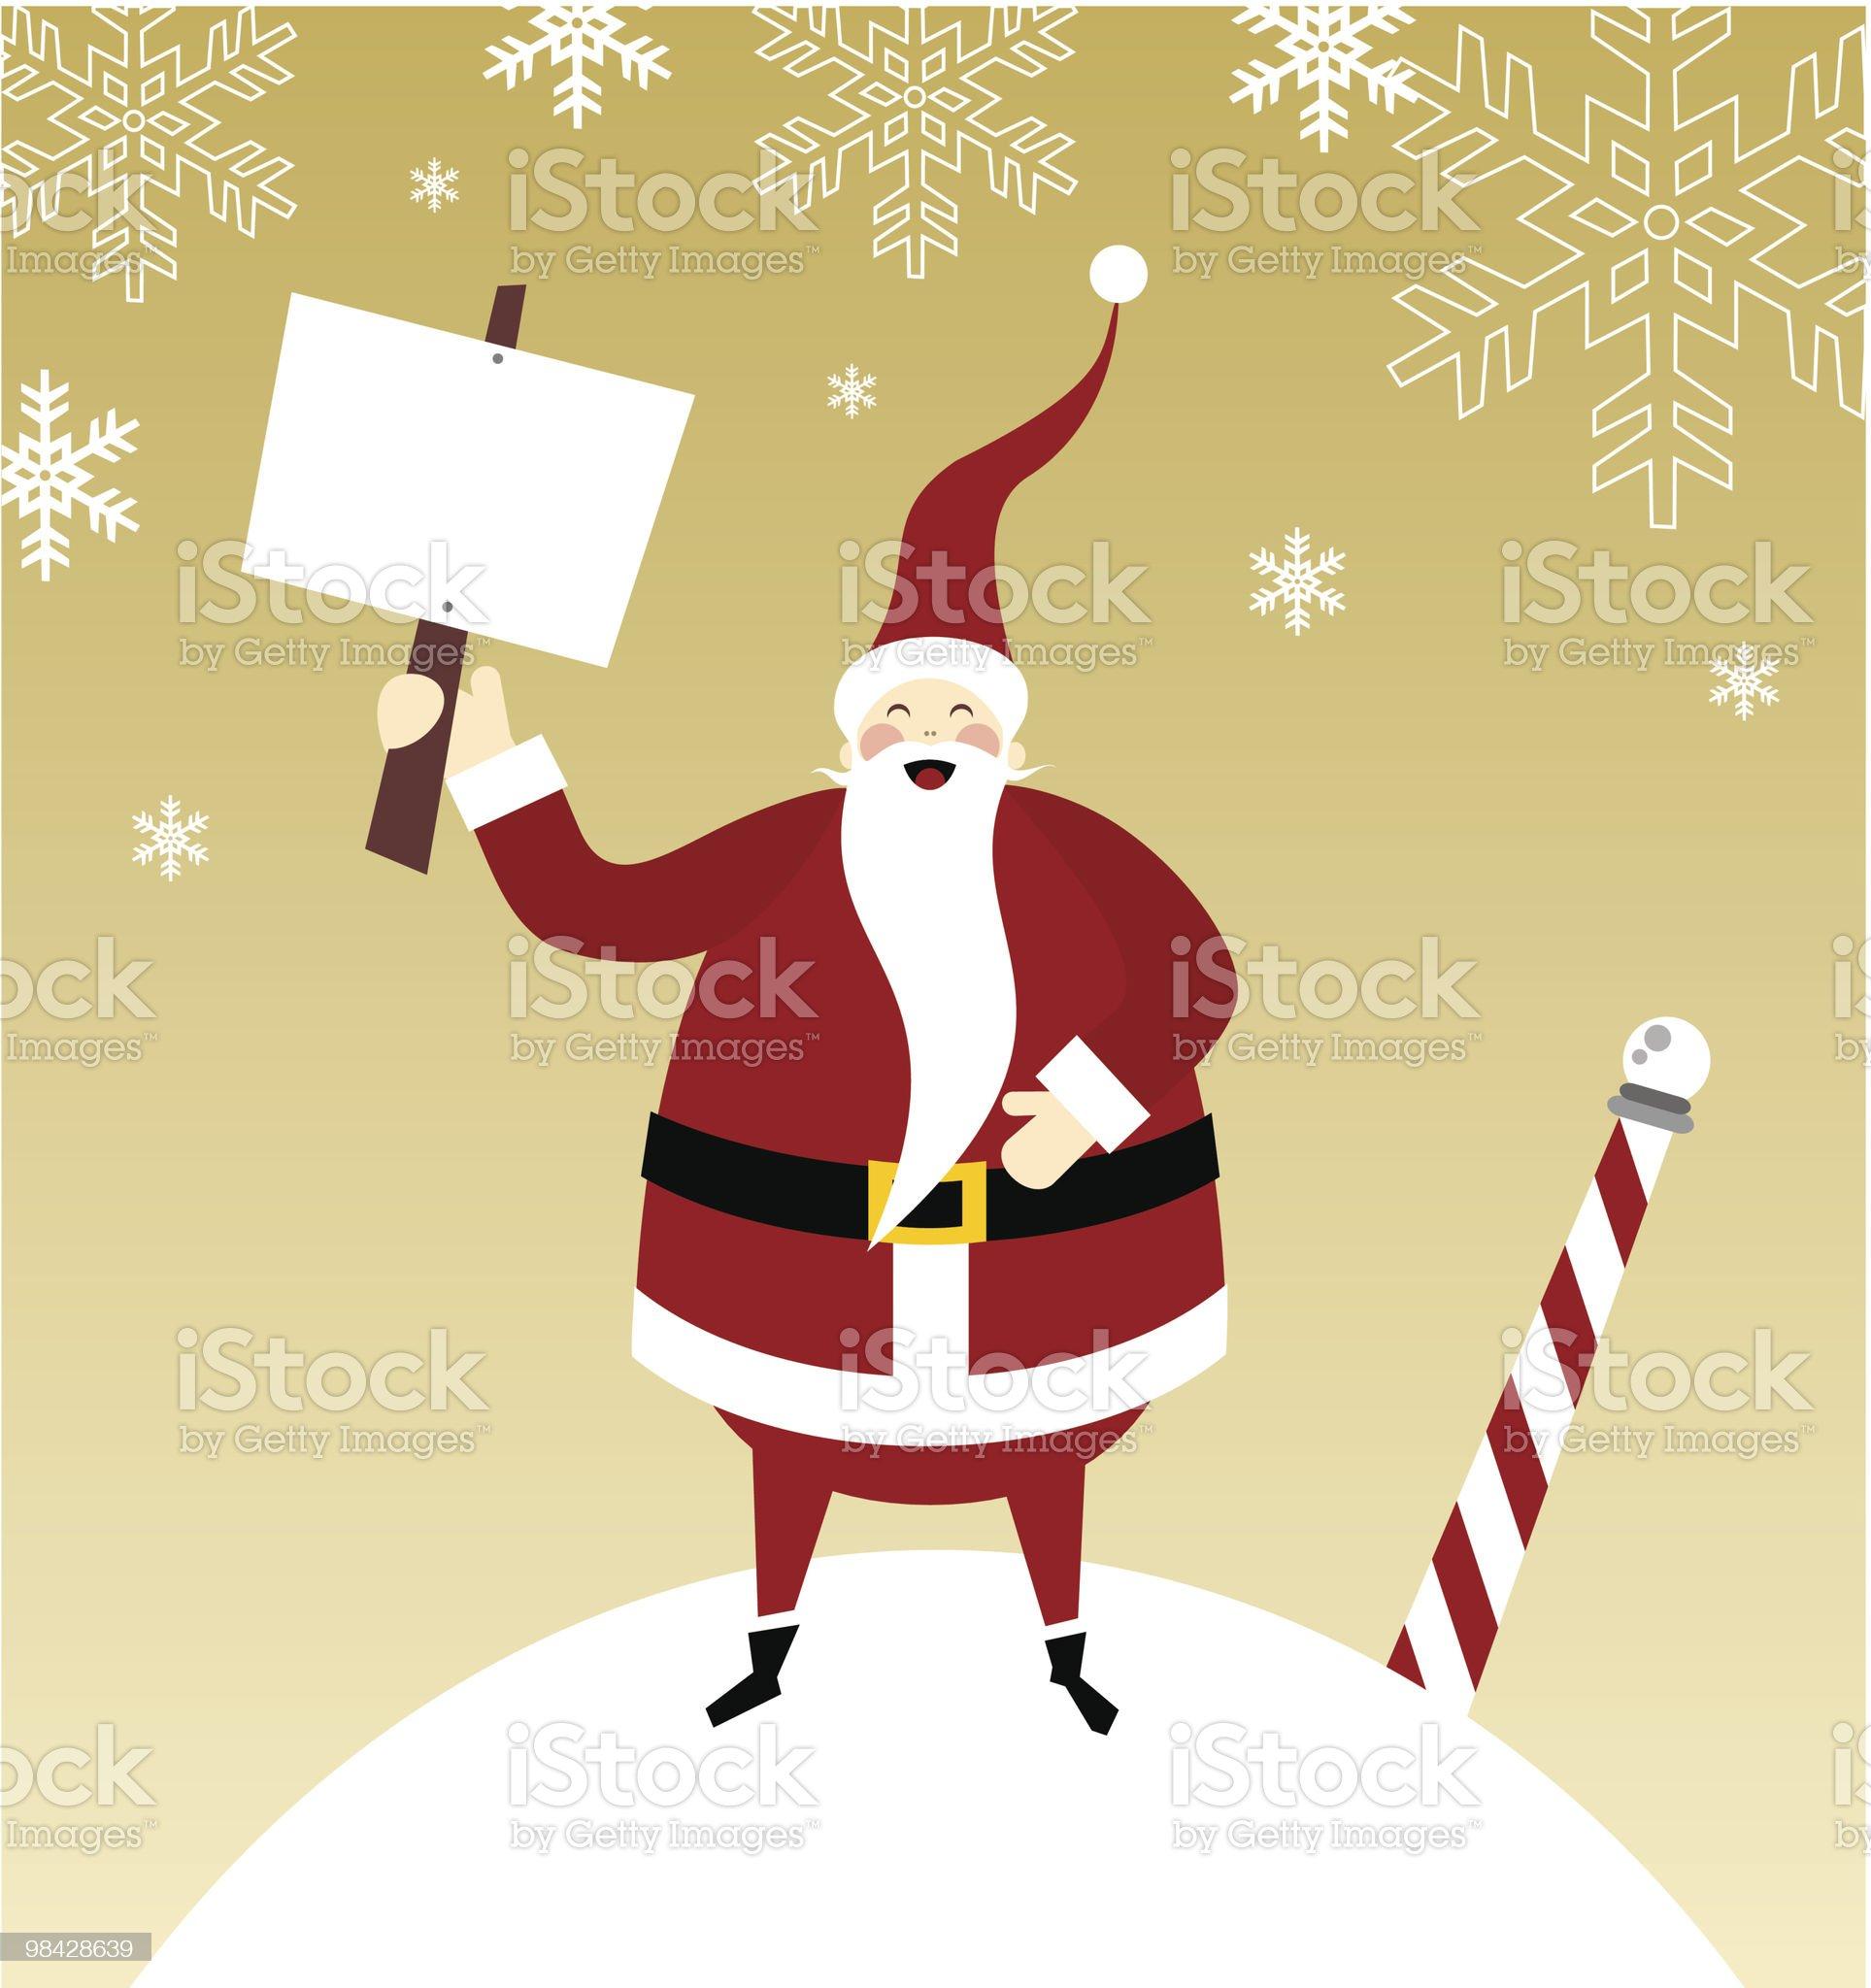 Happy Santa Claus on a snow mountain royalty-free stock vector art